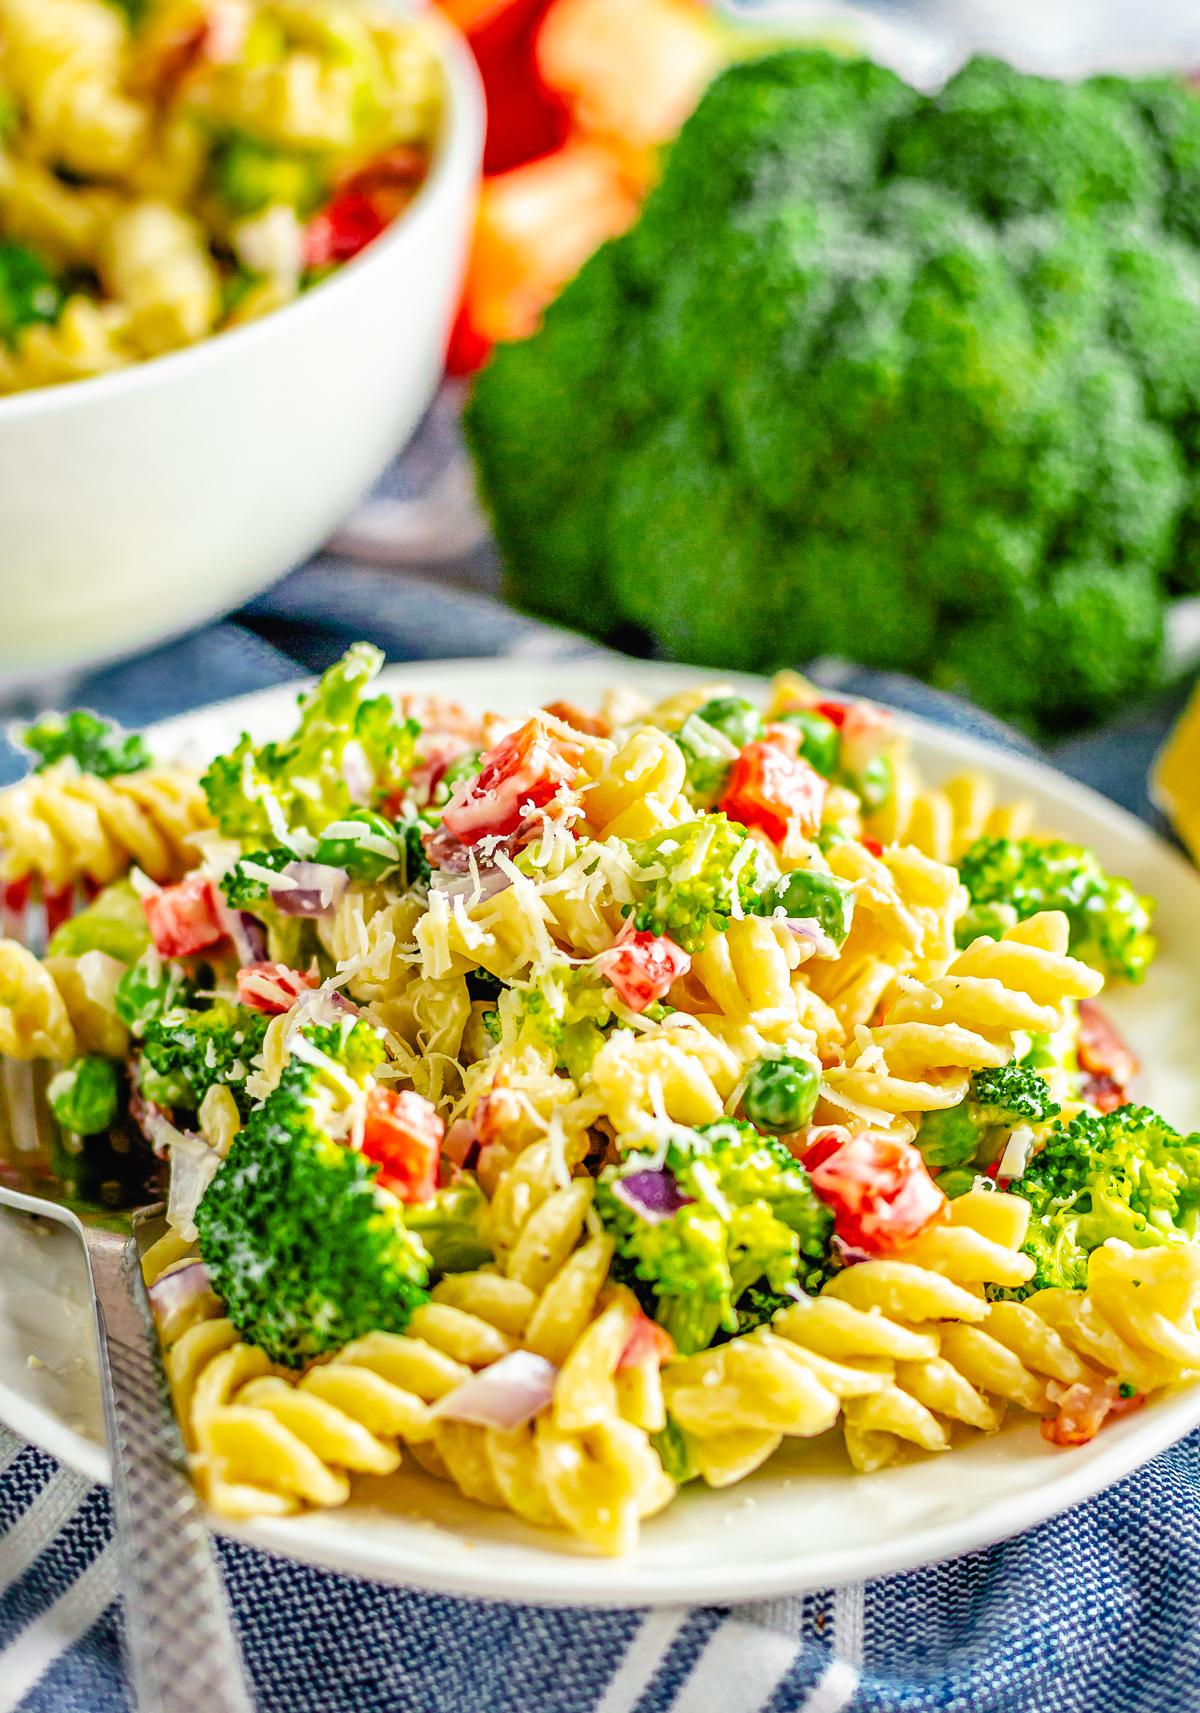 Close up of Broccoli Pasta Salad Recipe on plate